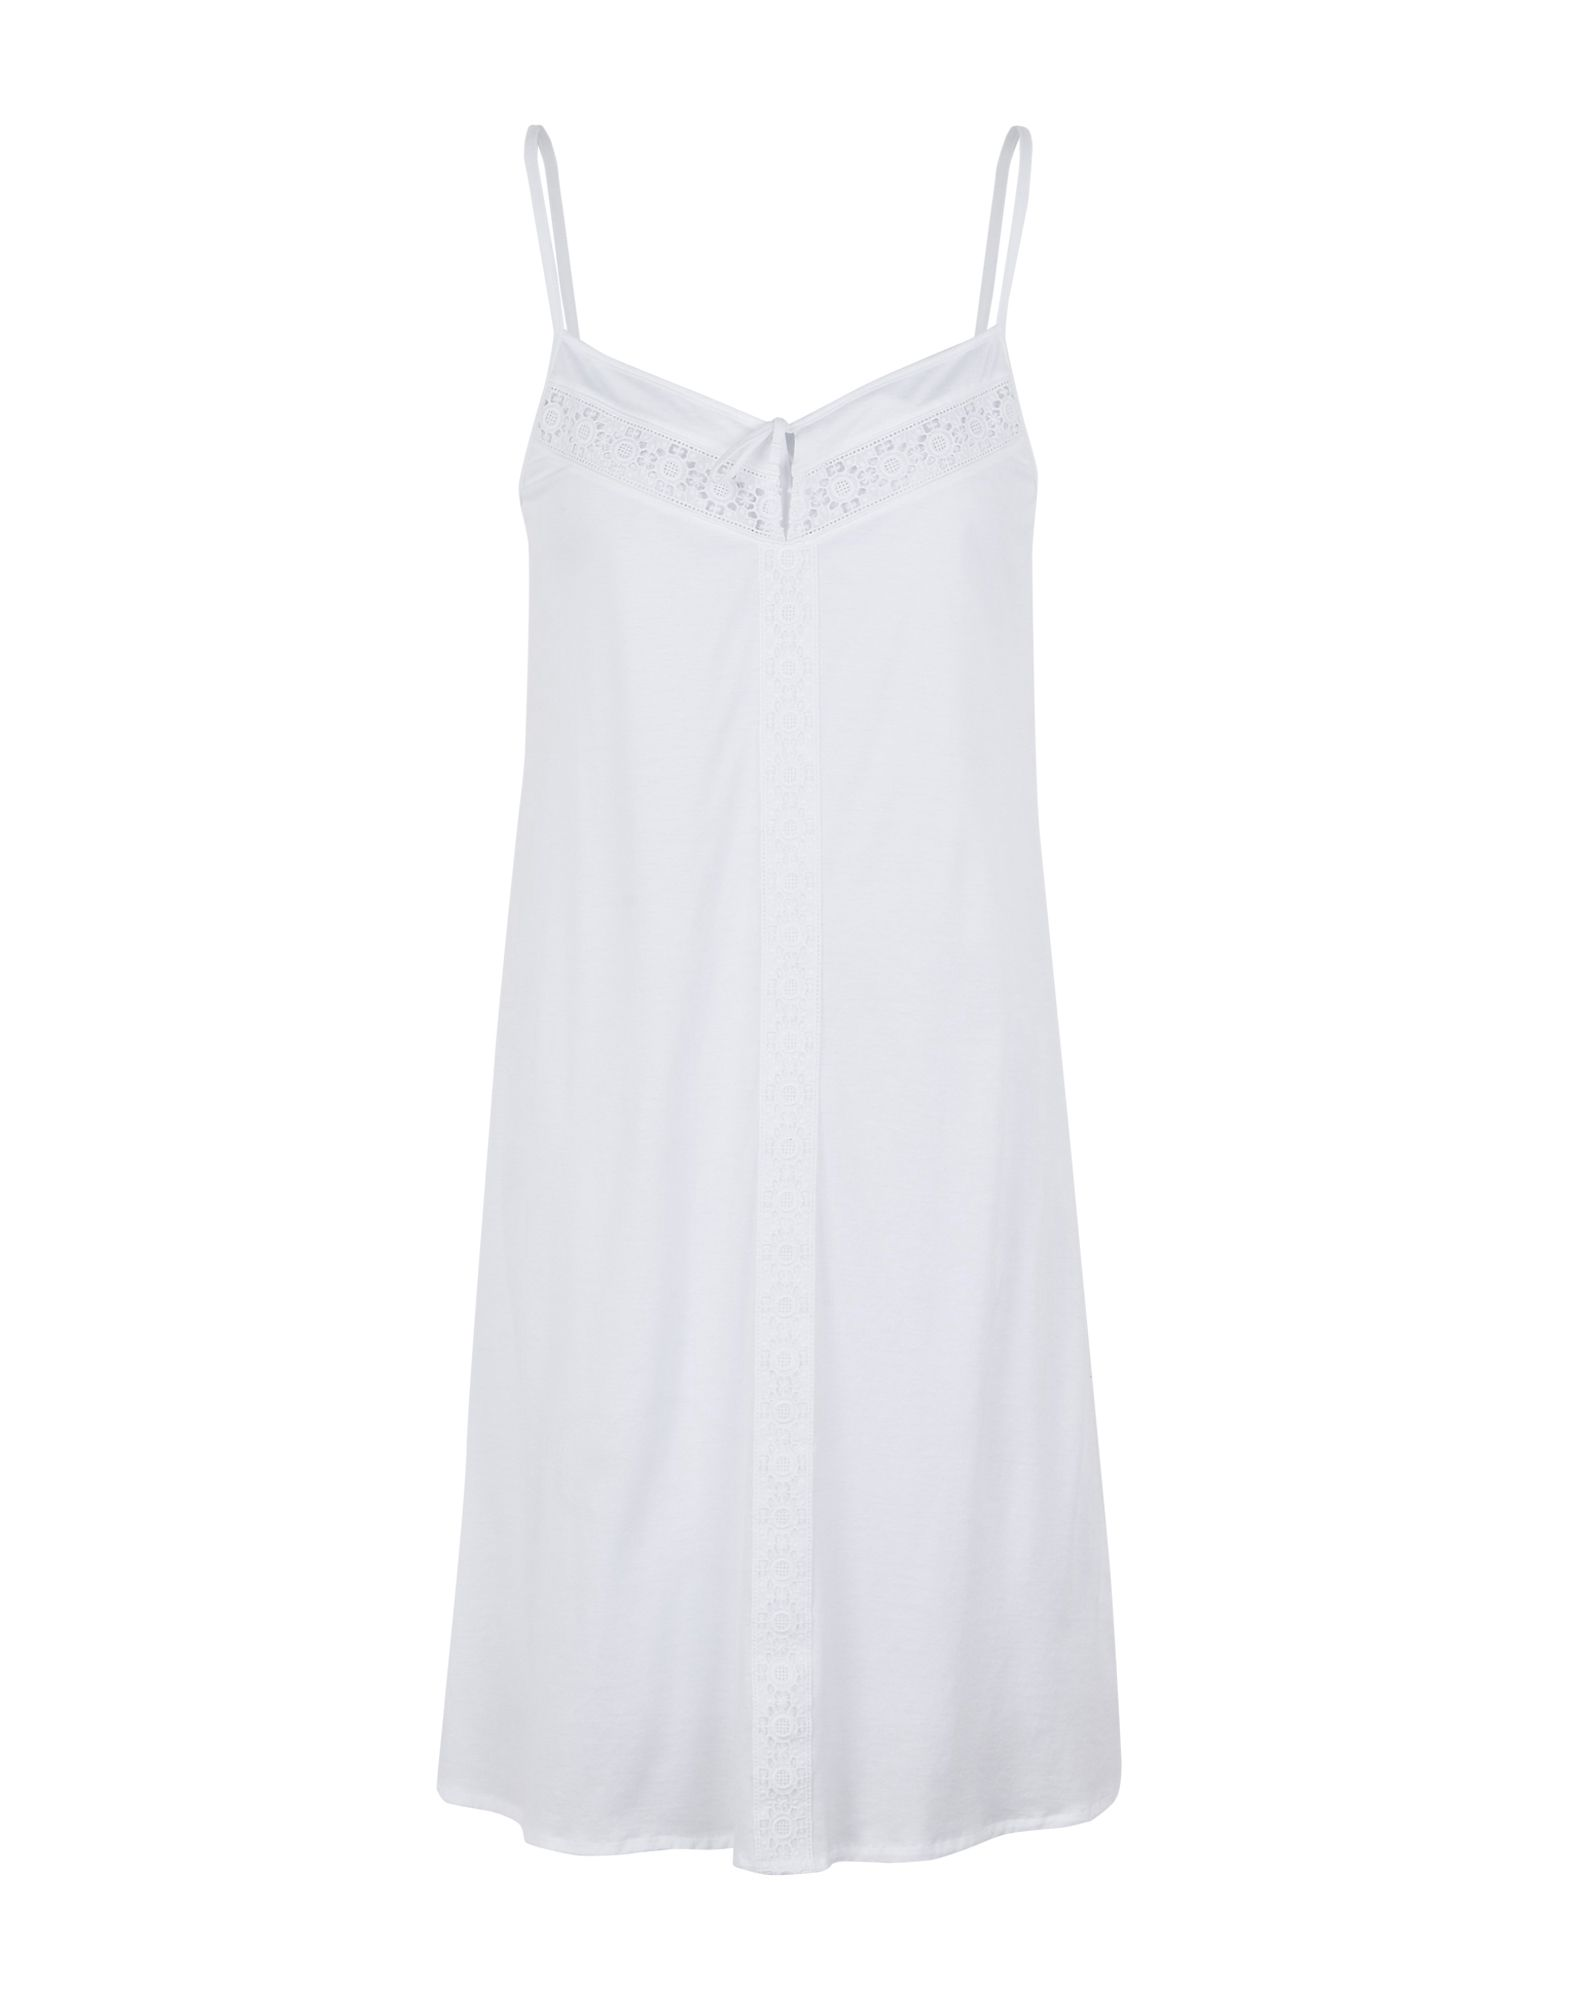 HANRO Ночная рубашка hanro бюстгальтер